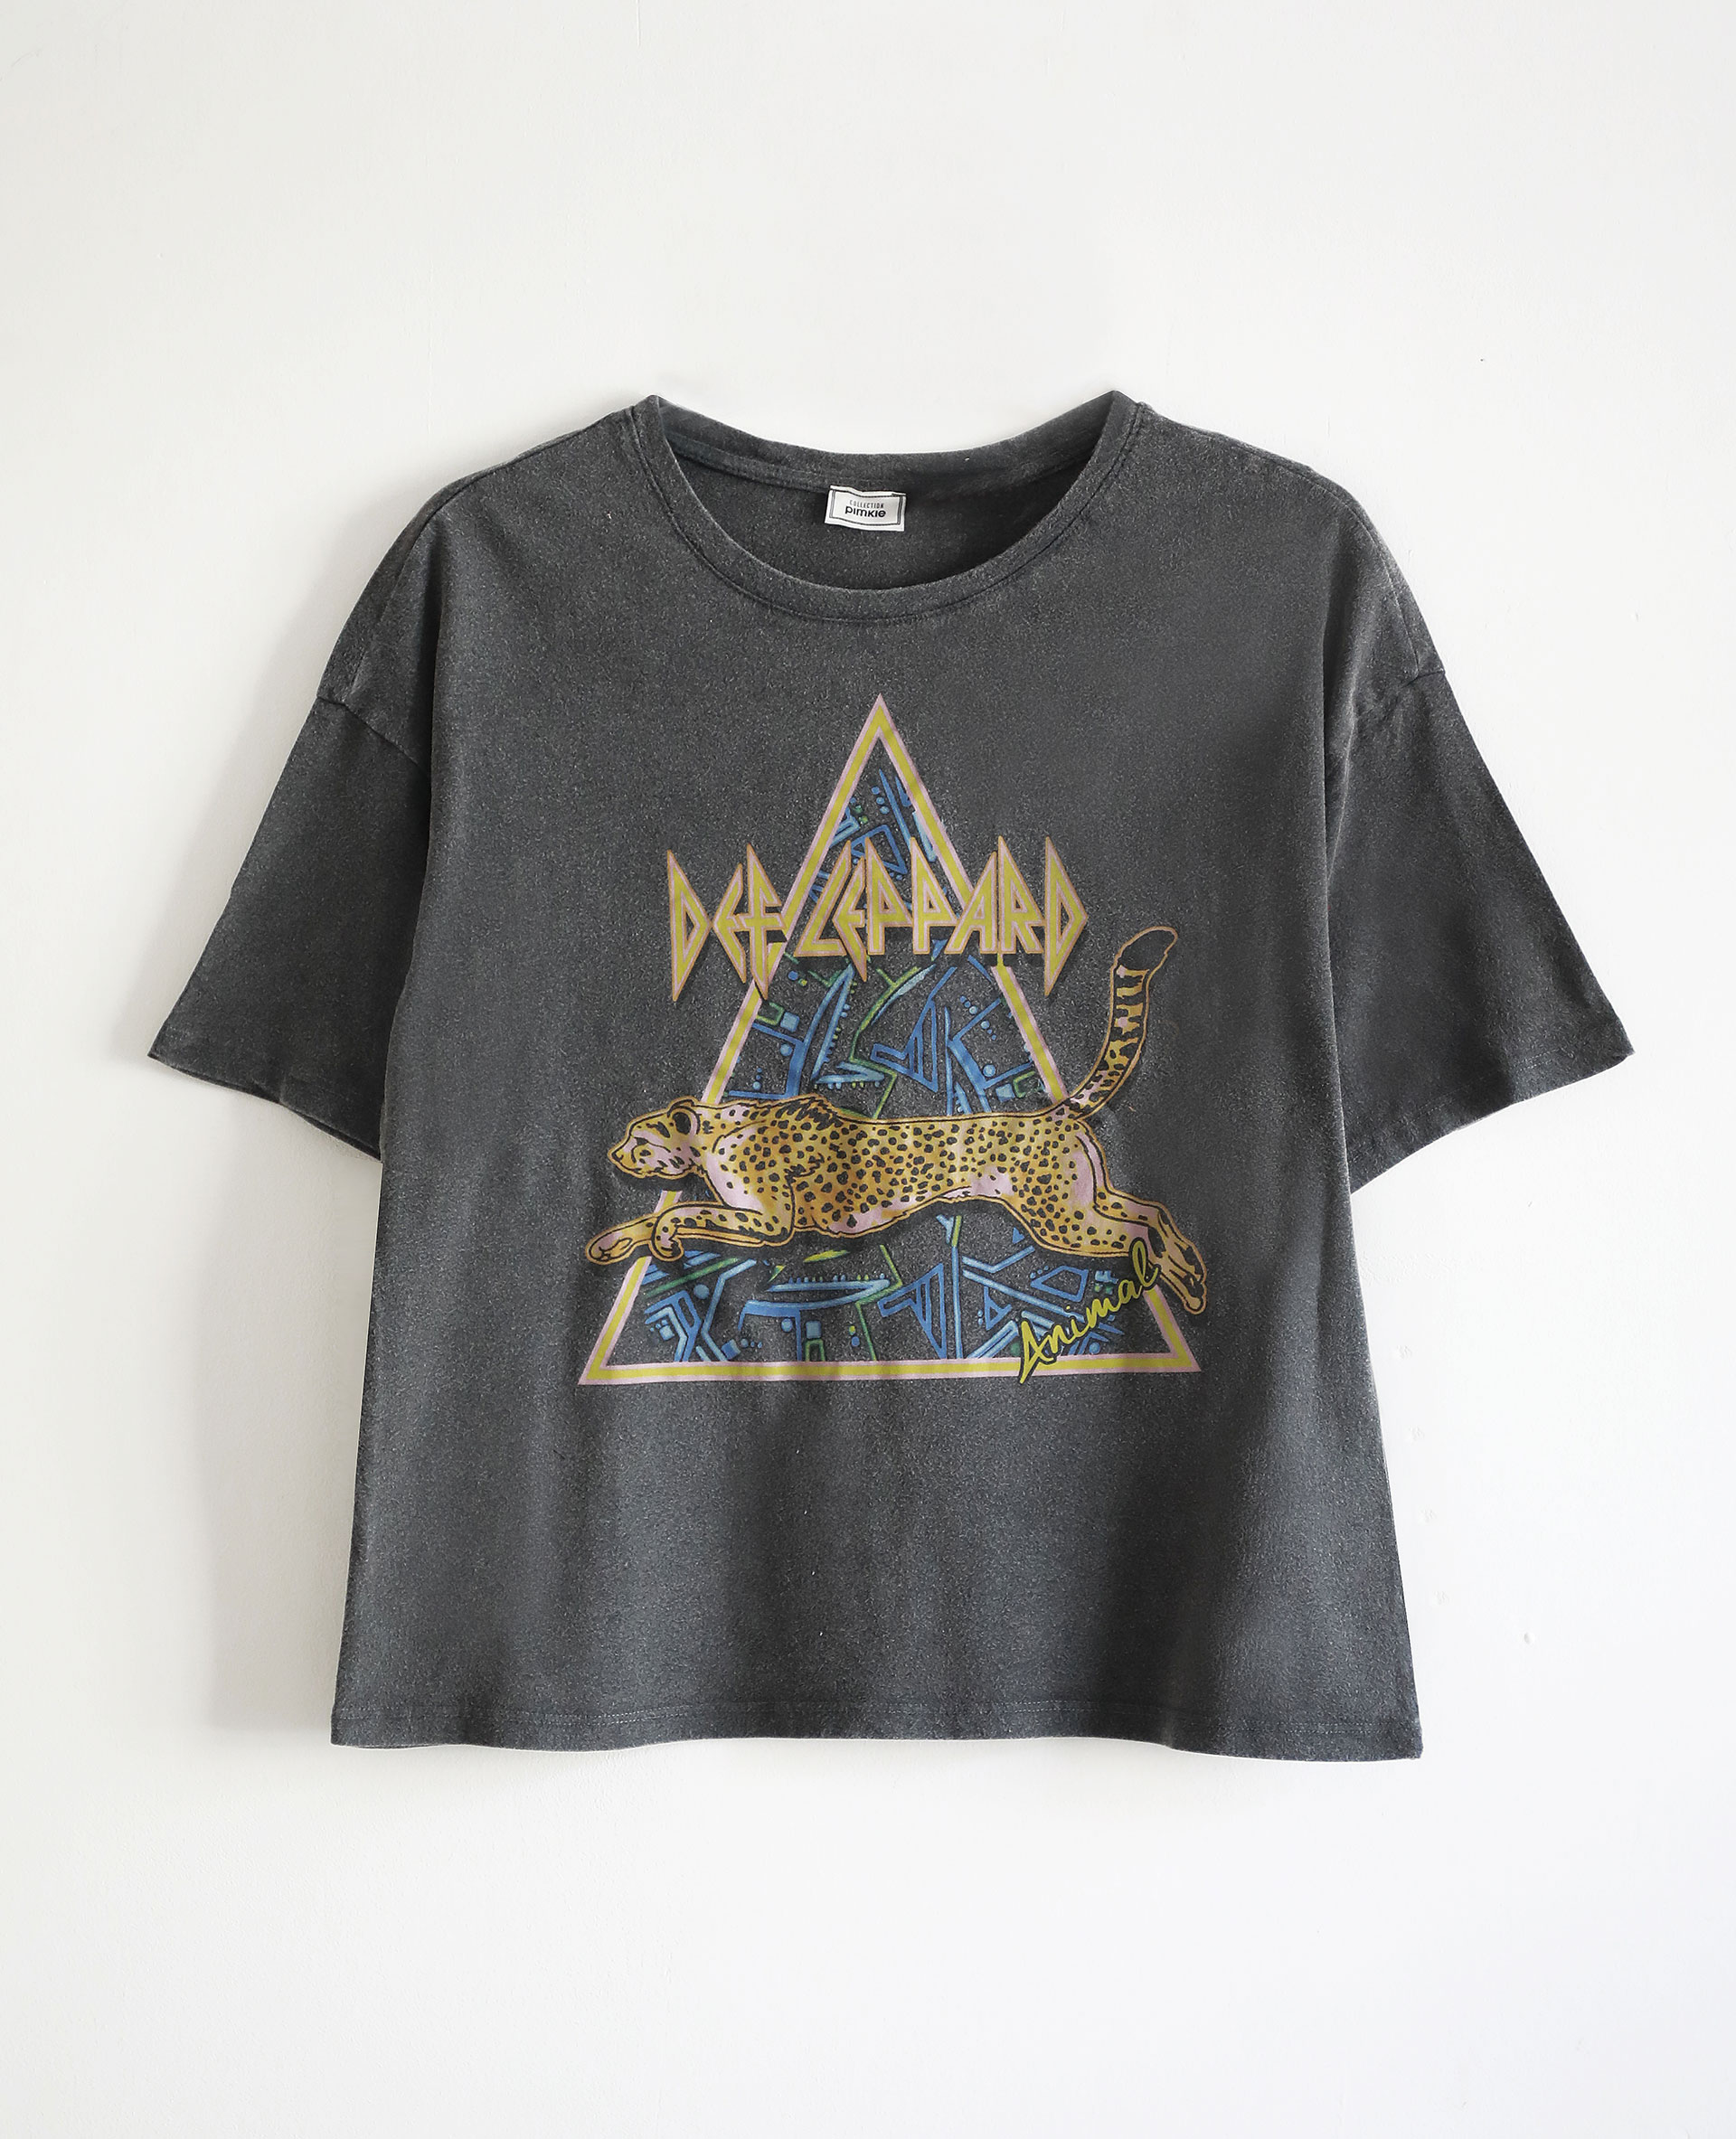 T-shirt Def Leppard gris anthracite - Pimkie